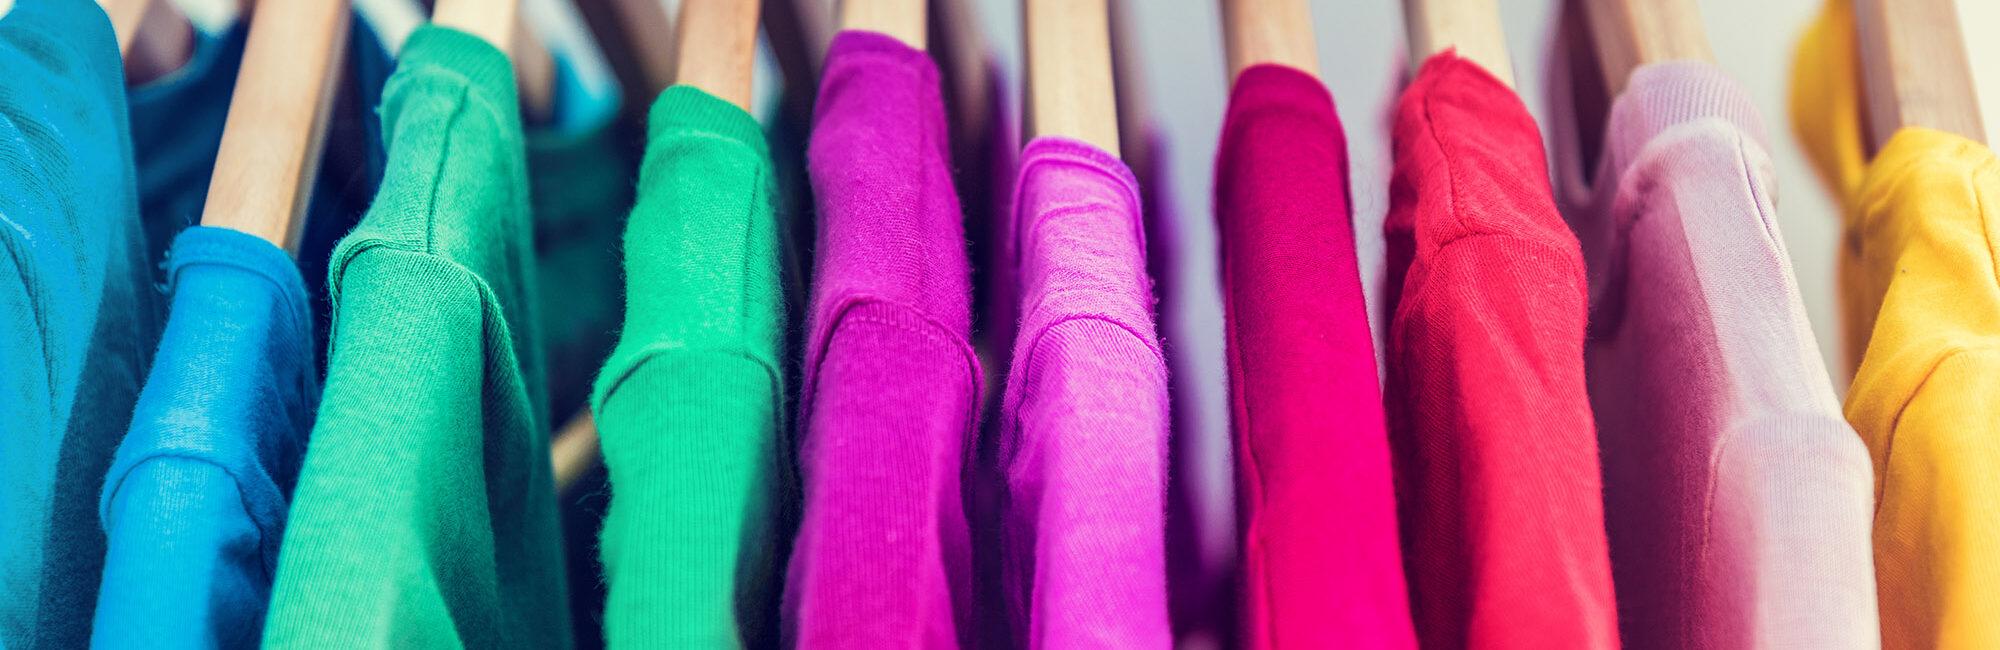 multi coloured tshirts on hangers